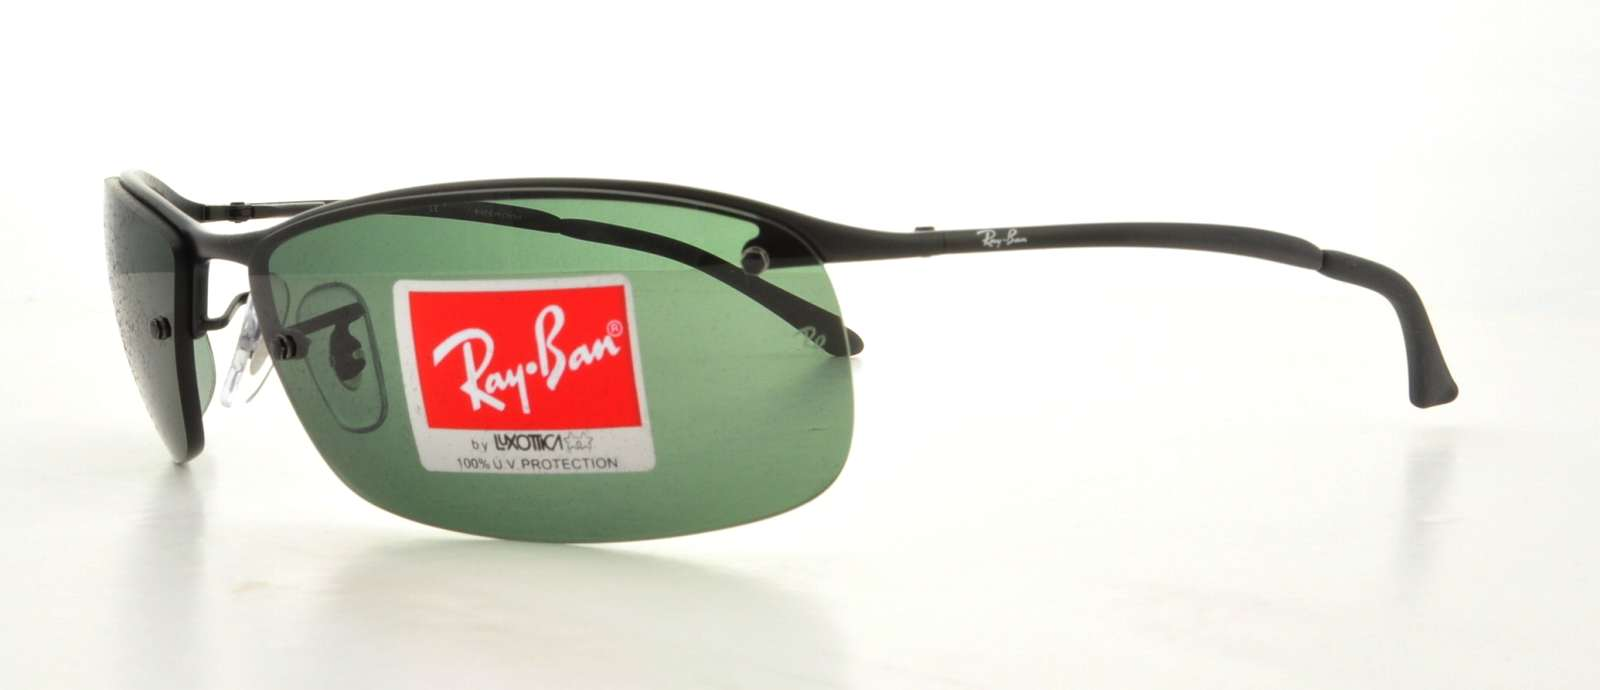 16dae353c32 Designer Frames Outlet. Ray Ban RB3183